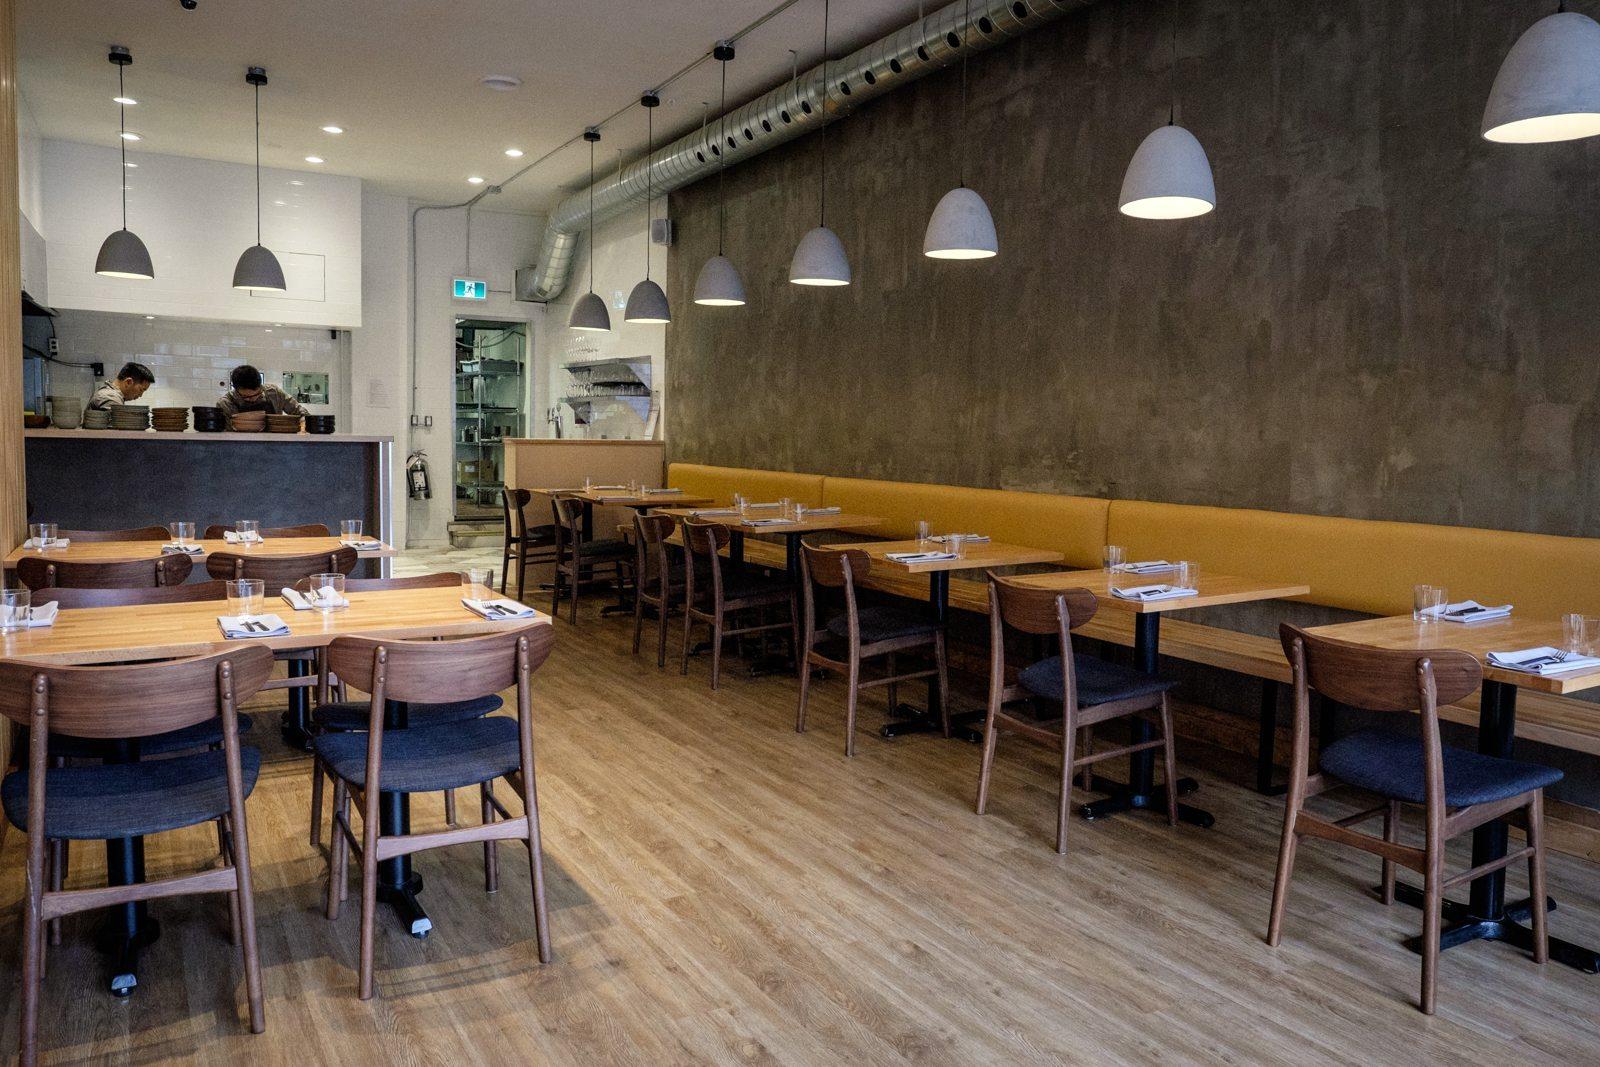 toronto-restaurants-canis-queen-west-canadian-dining-room-2